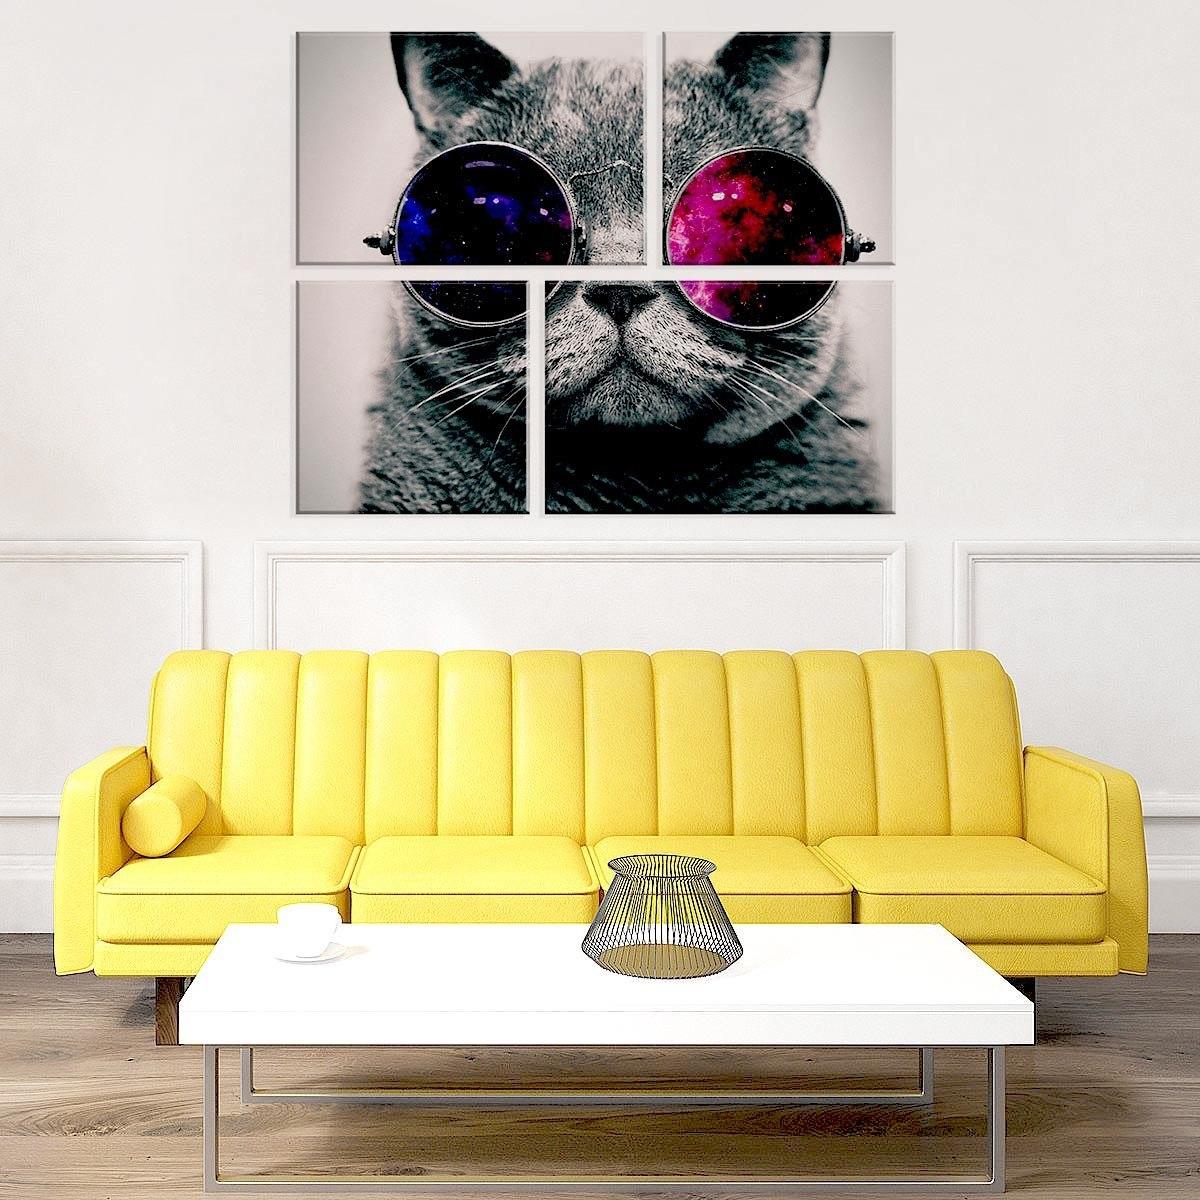 conjunto de 4 telas decorativas em canvas gato de óculos úni. Carregando  zoom. c3f9ab1a9a